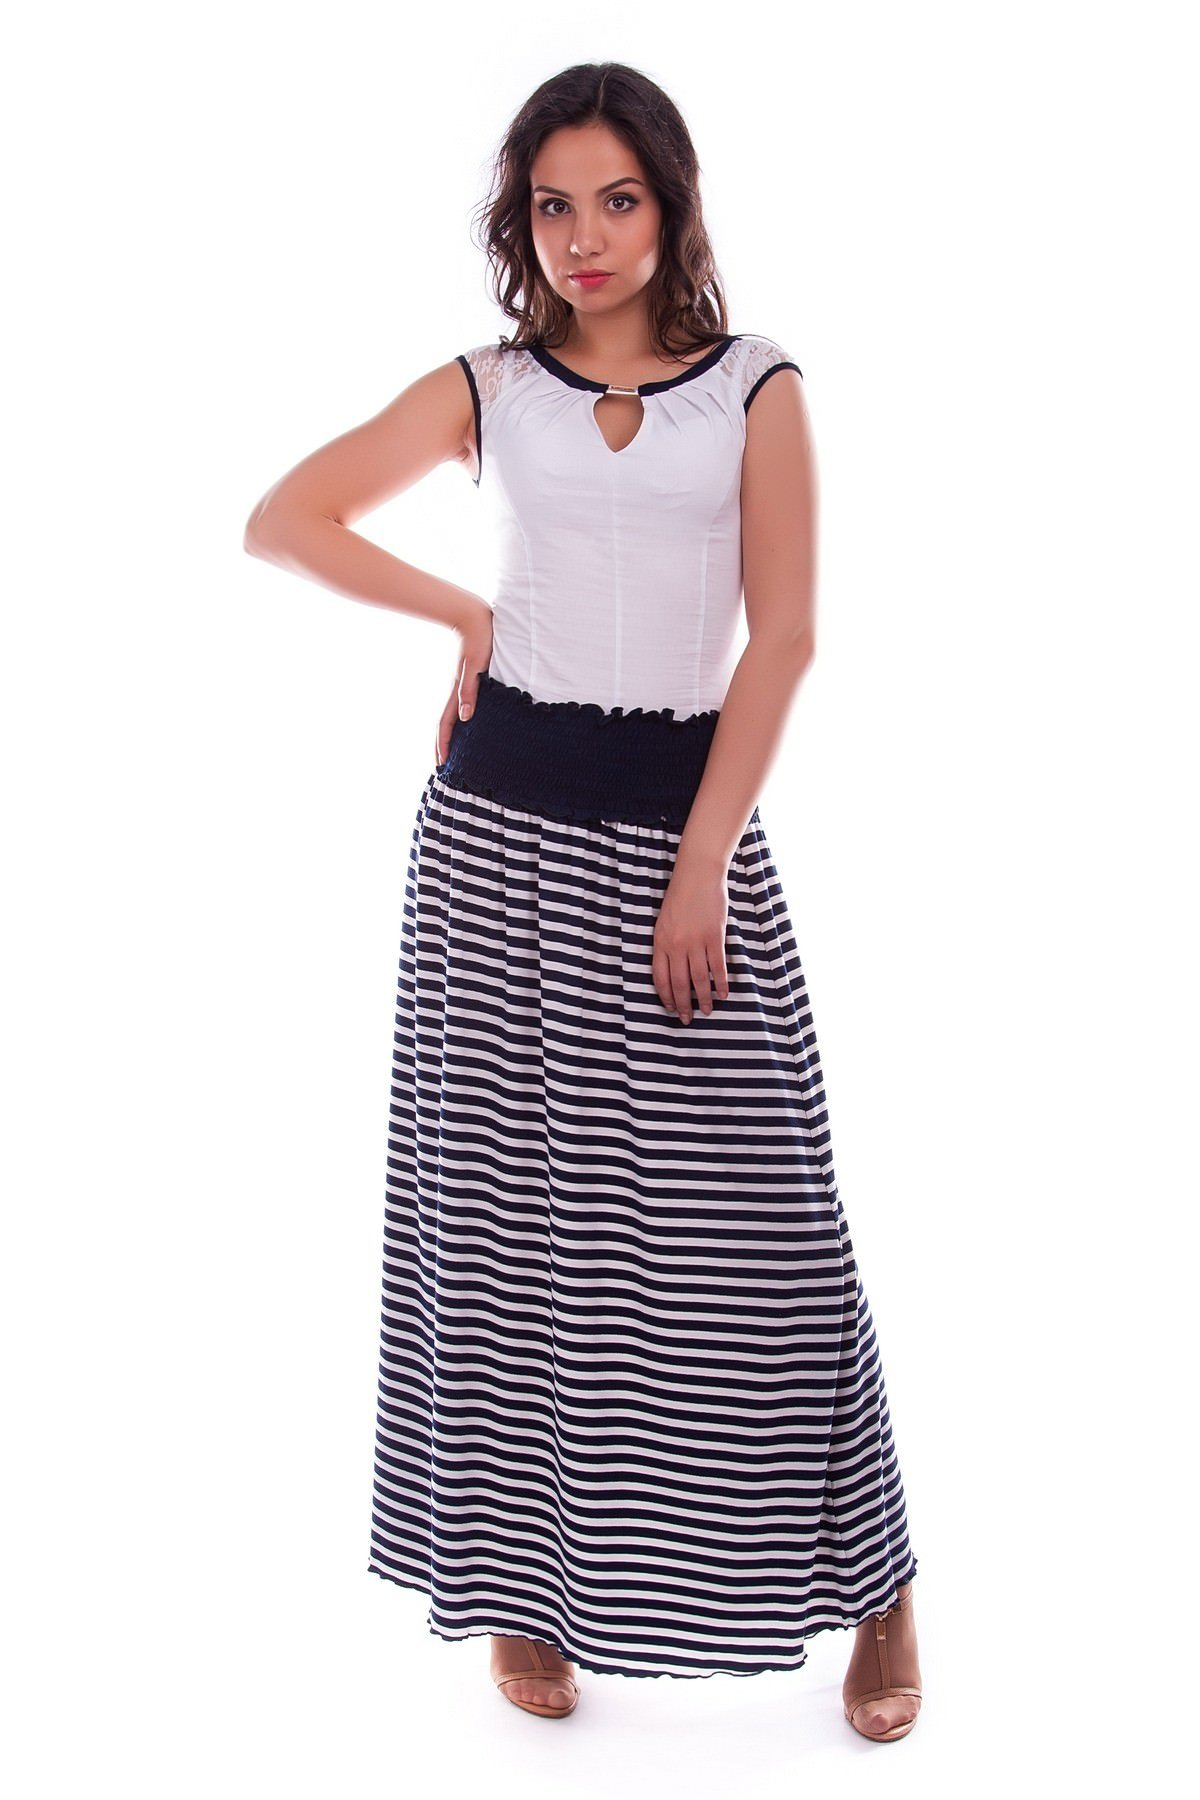 Купить женские юбки оптом  Юбка Ненси